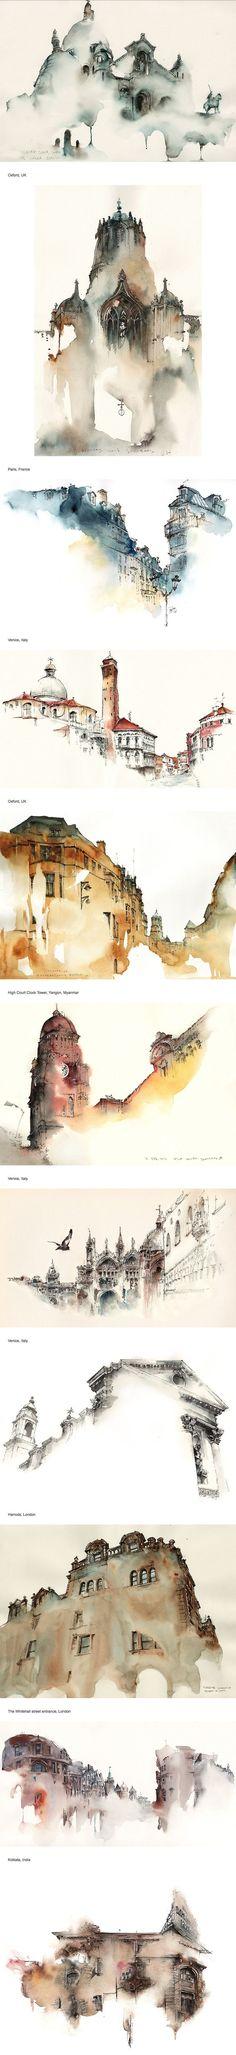 WOW NICE WORK.... Elusive Architecture in Watercolors of Korean Artist Sunga Park: